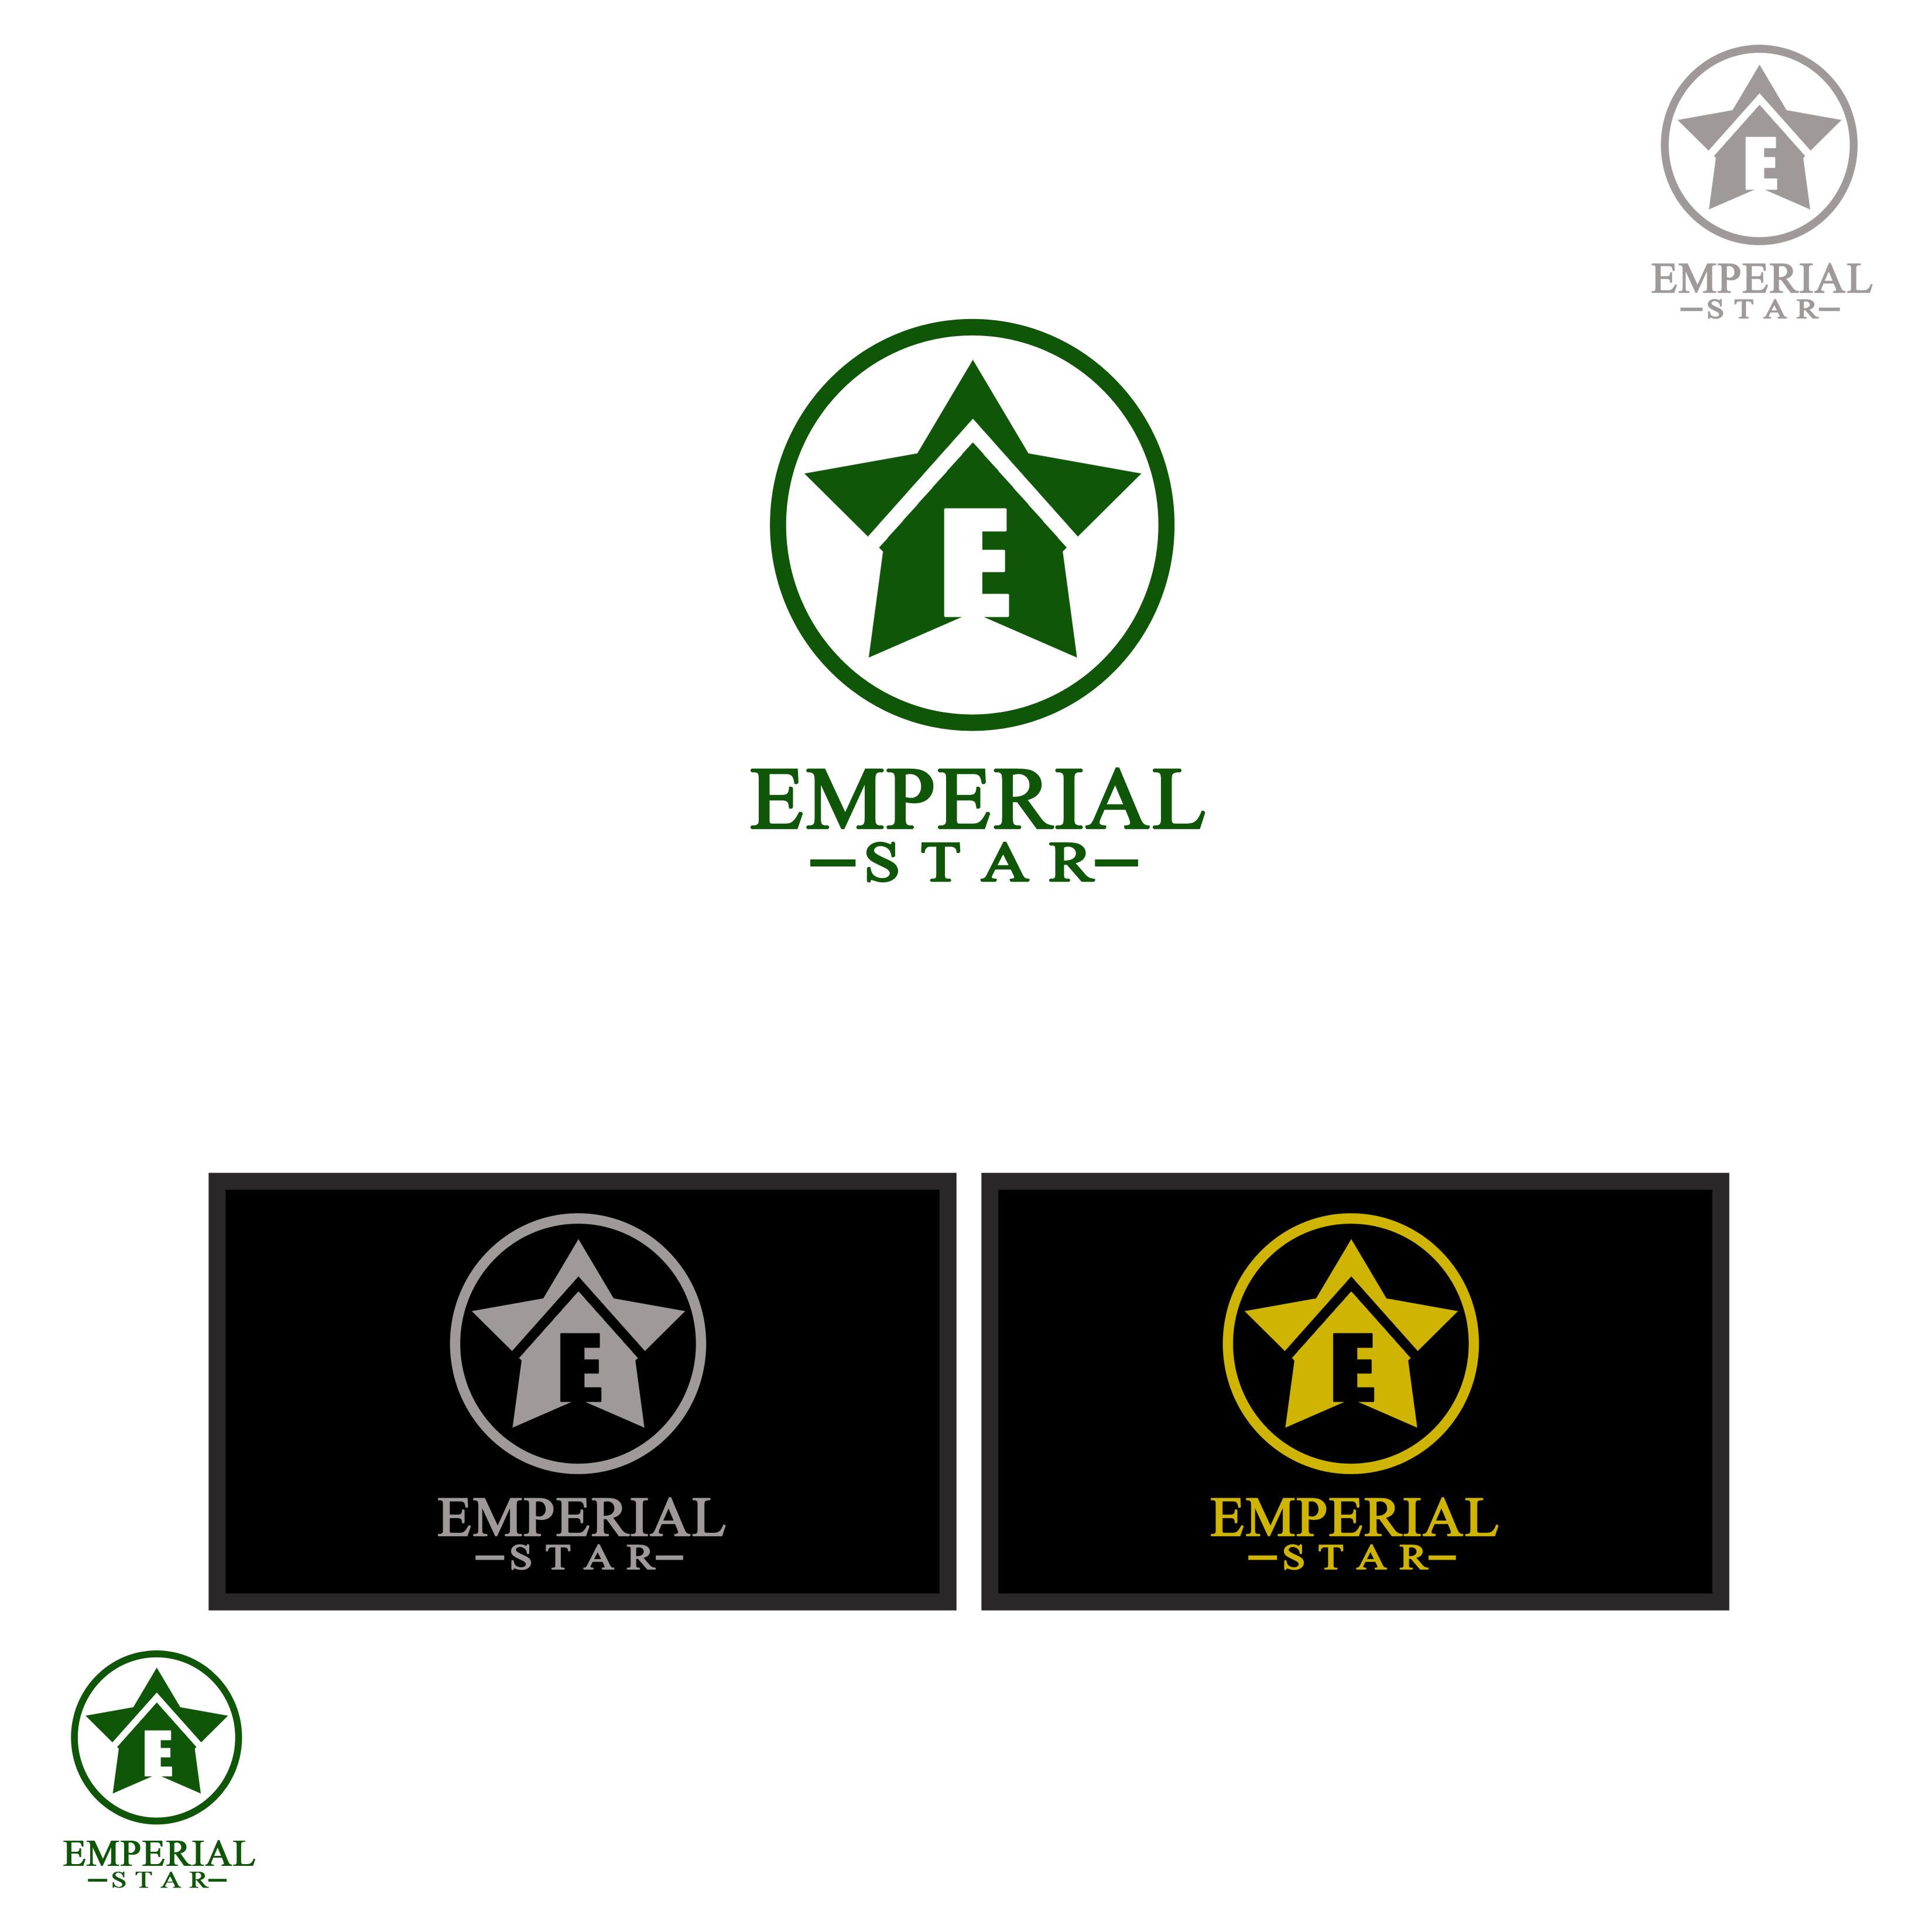 Logo Design by Alan Esclamado - Entry No. 110 in the Logo Design Contest Emperial Star Logo Design.